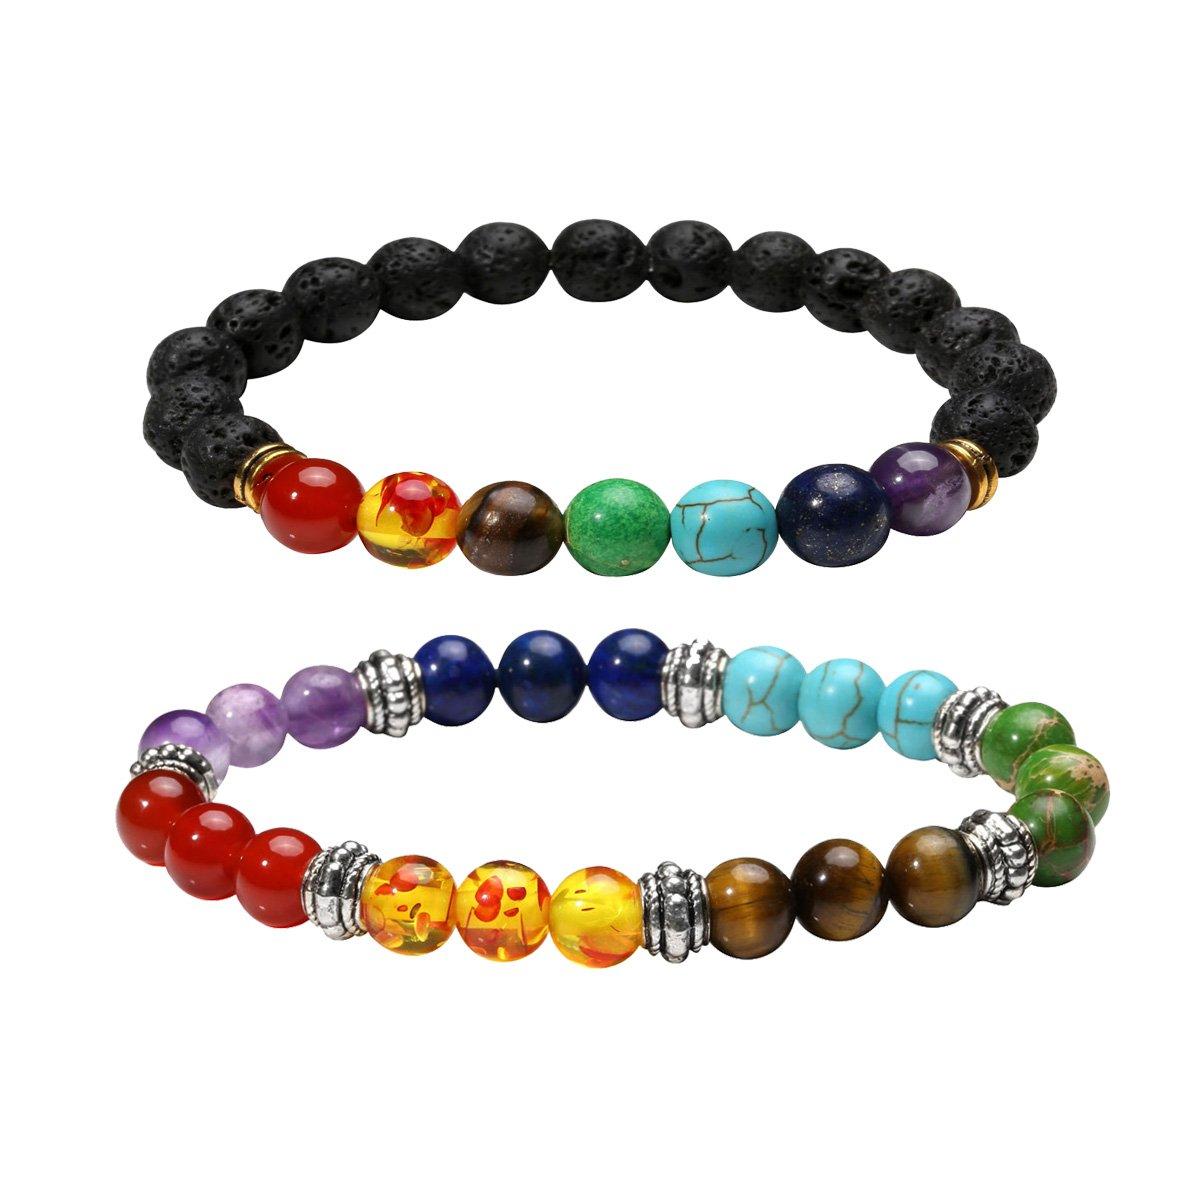 Eigso 7 Chakra Diffuser Bracelets Set for Women Men Reiki Healing Meditation Lava Rock Stone Beads